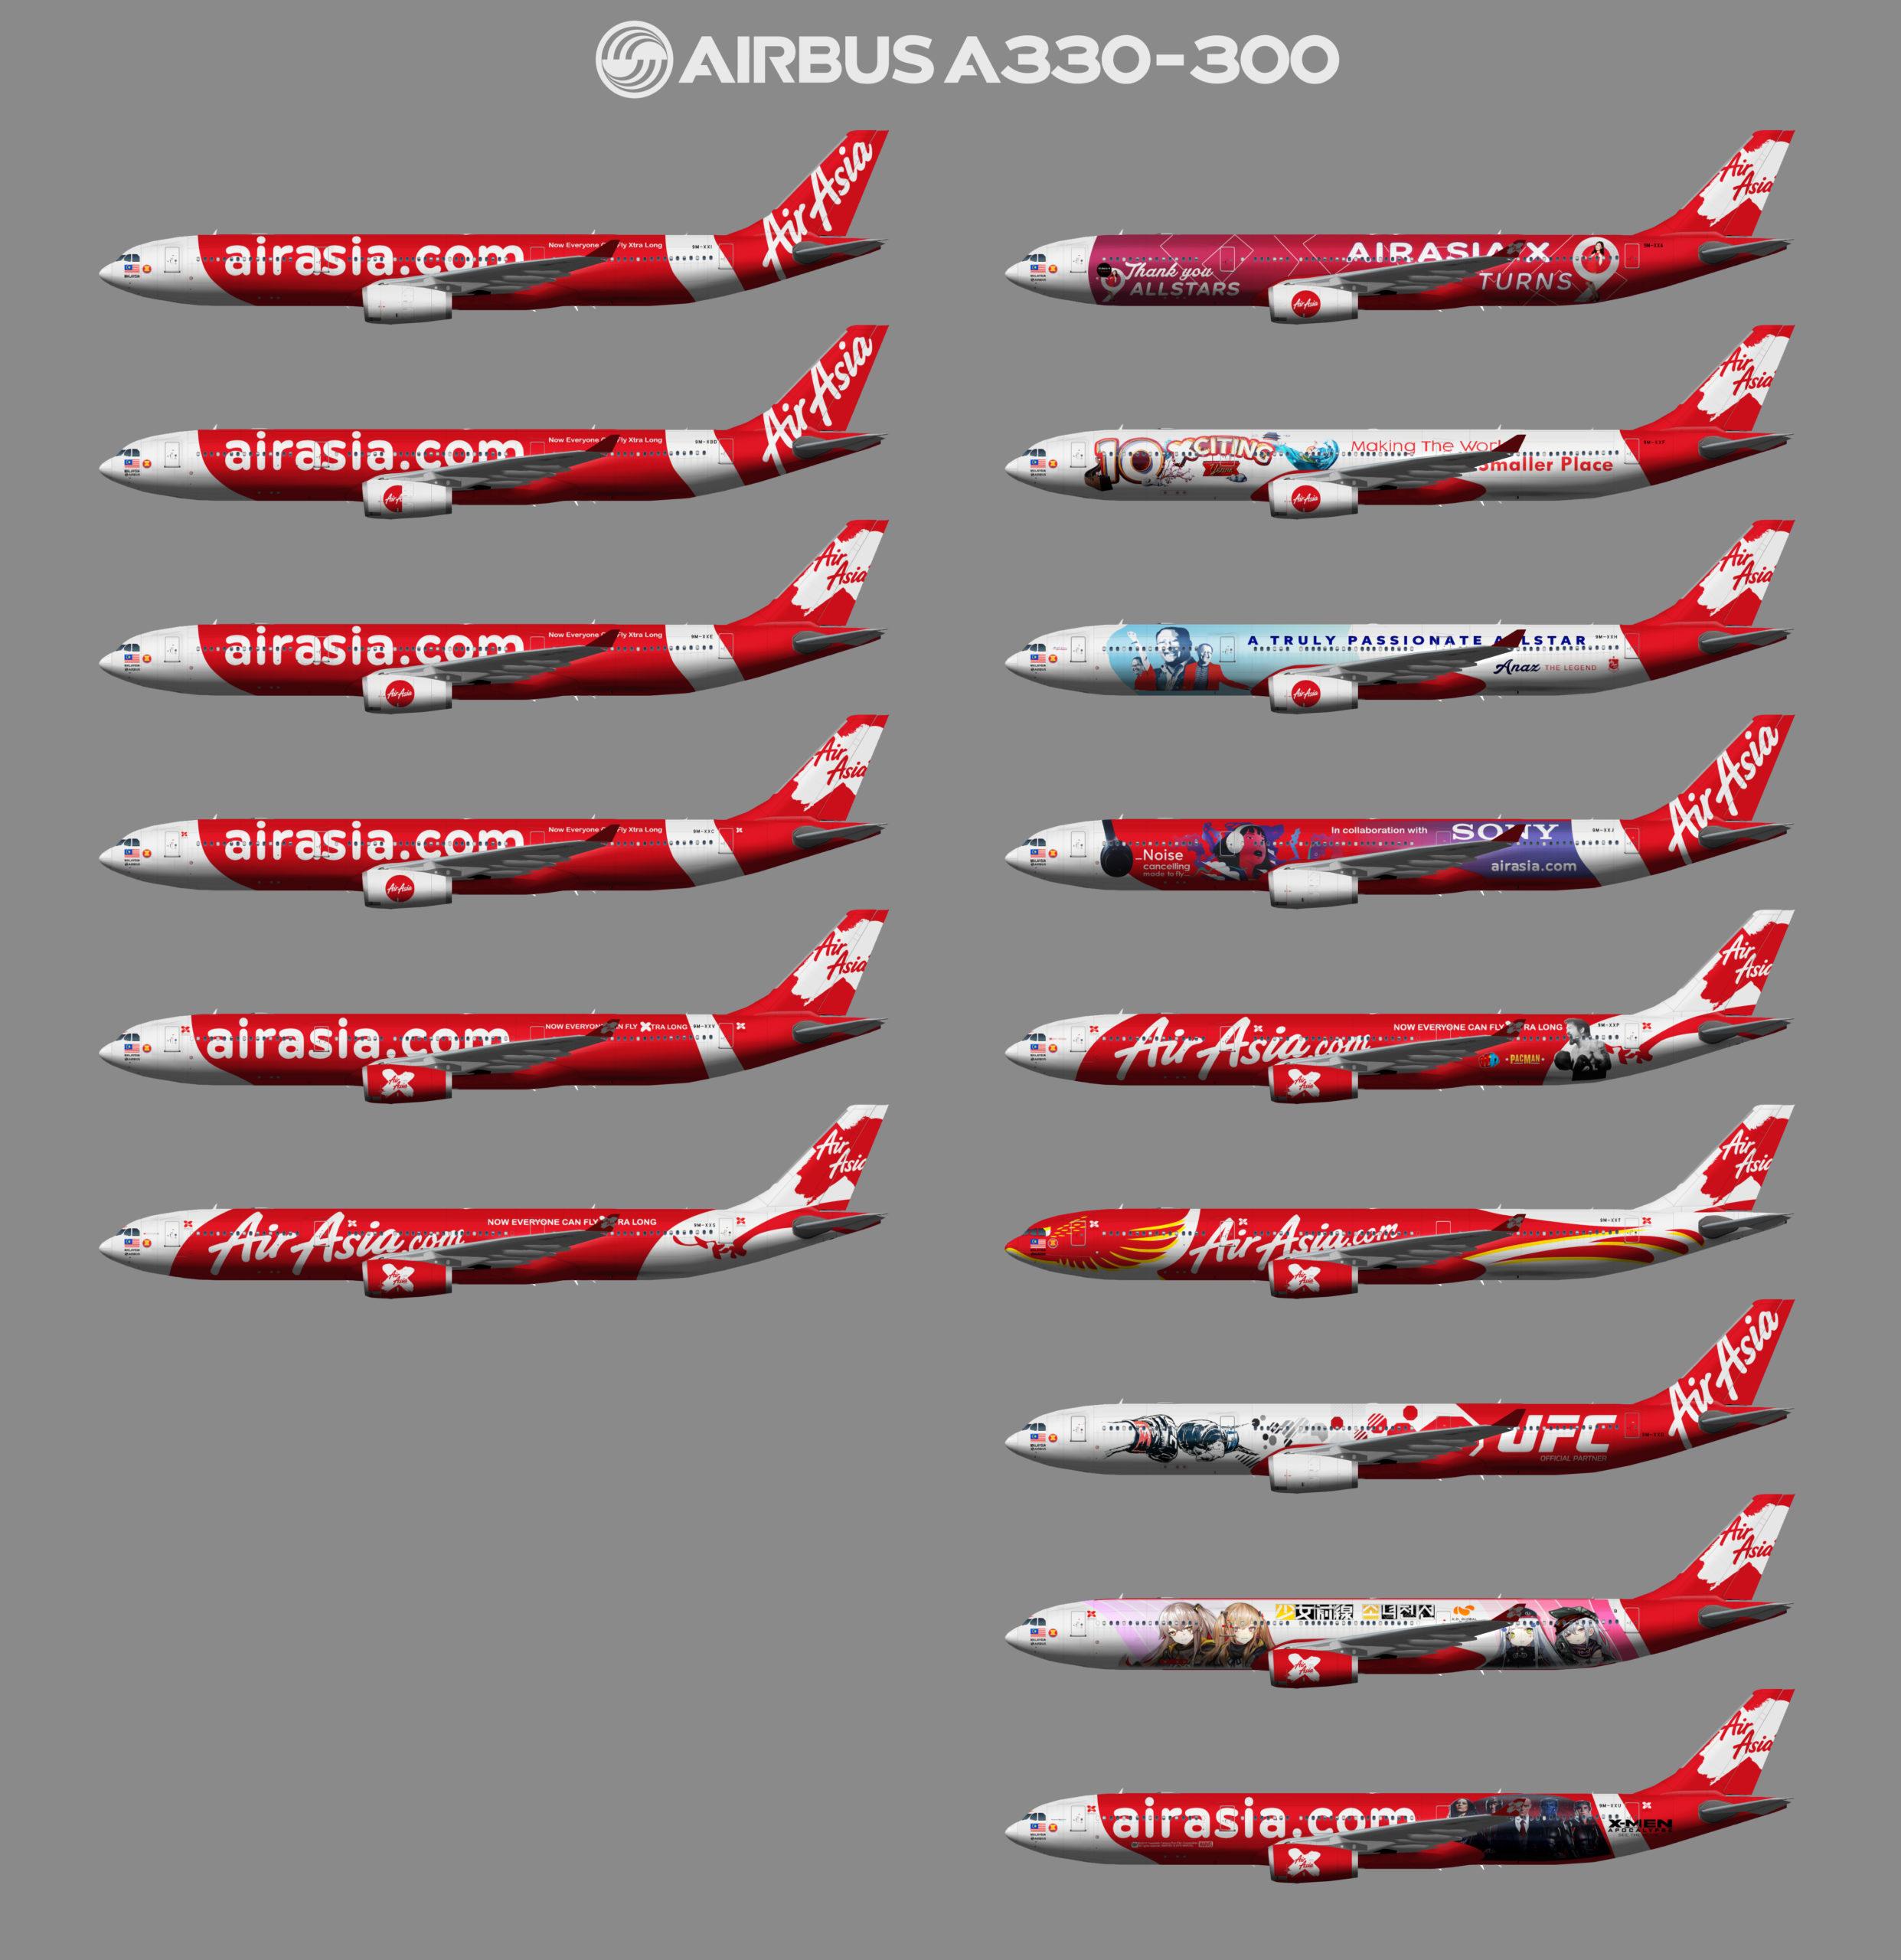 AirAsiaX Airbus A330-300 (representative fleet)